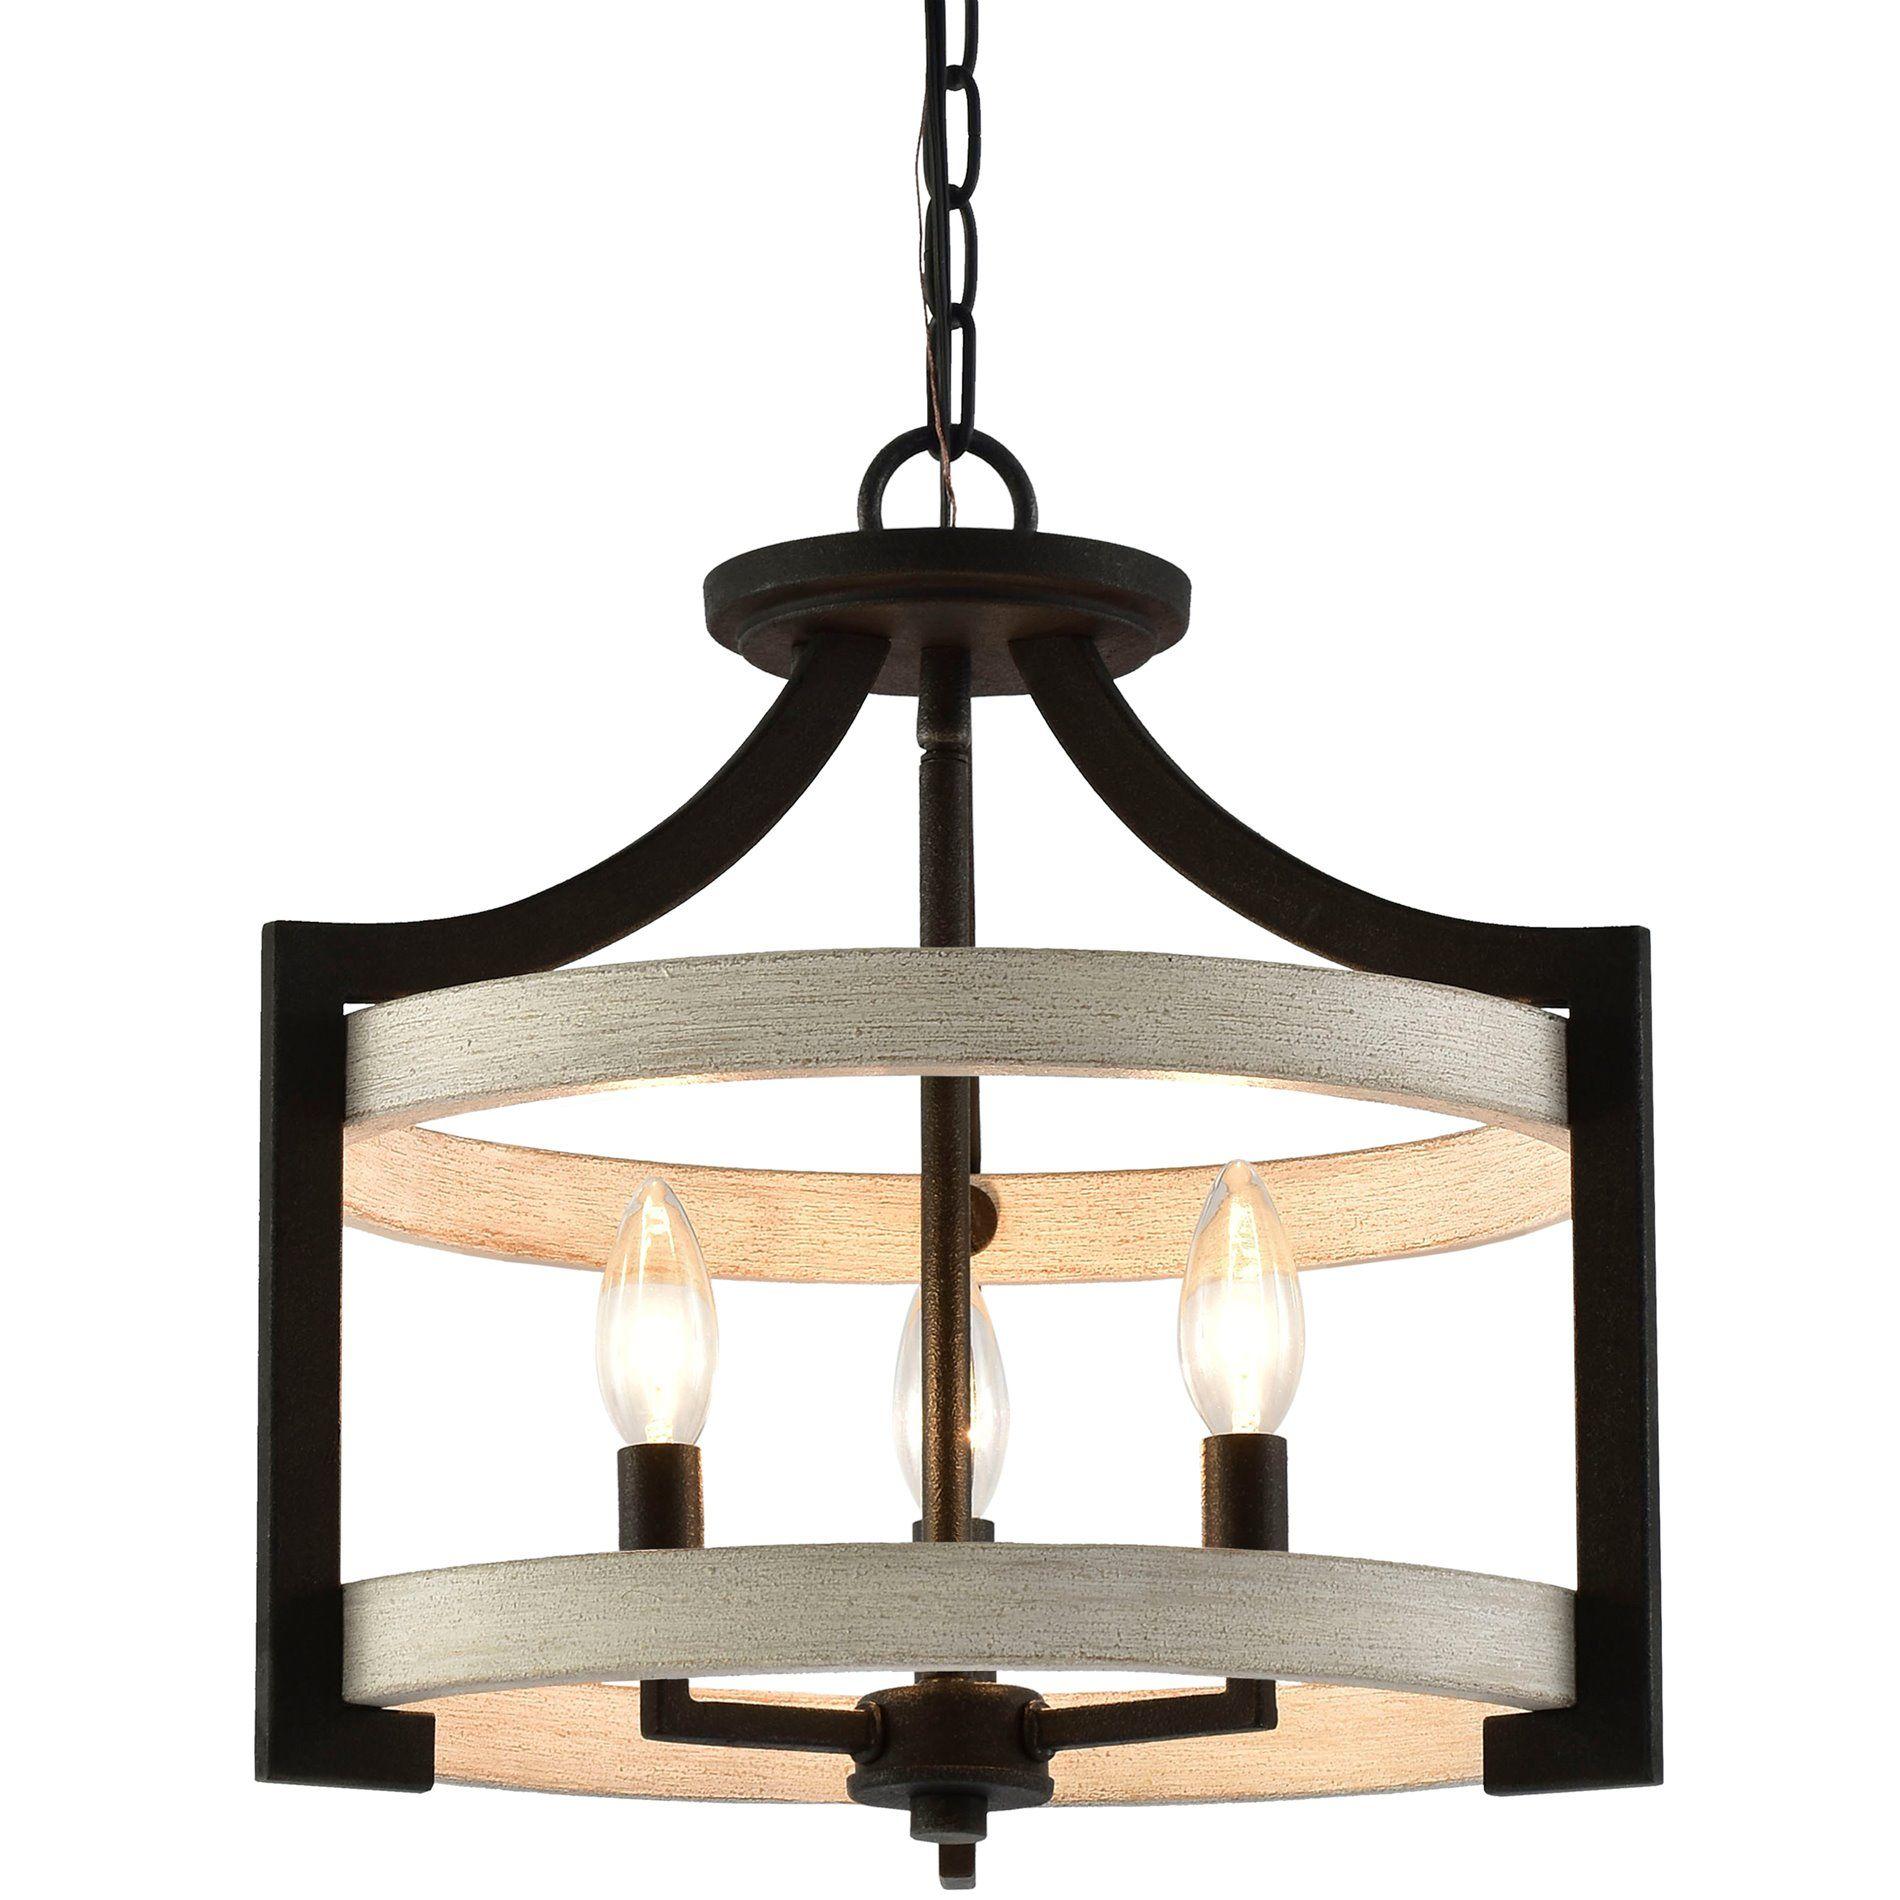 Home Drum shade, Pendant chandelier, Semi flush